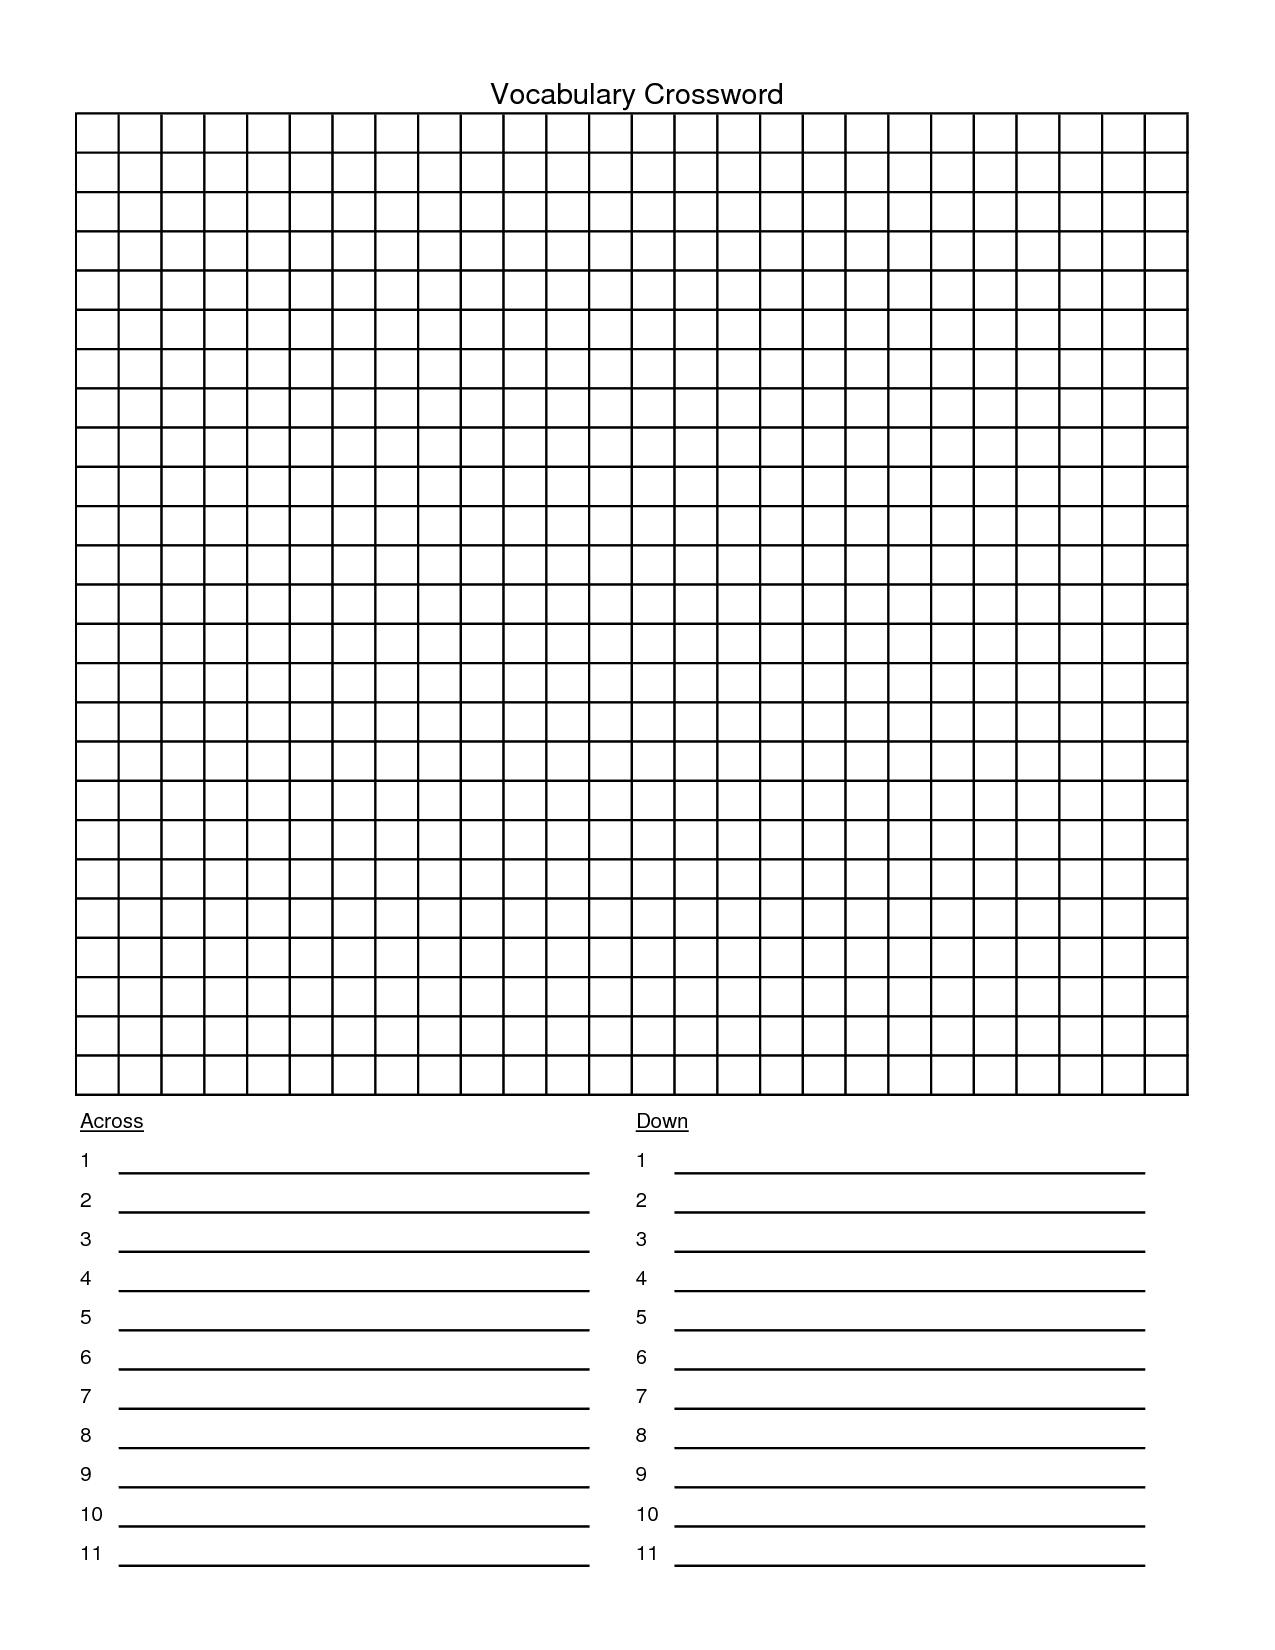 Crossword Puzzle Template - Yapis.sticken.co - Crossword Puzzle Template Printable